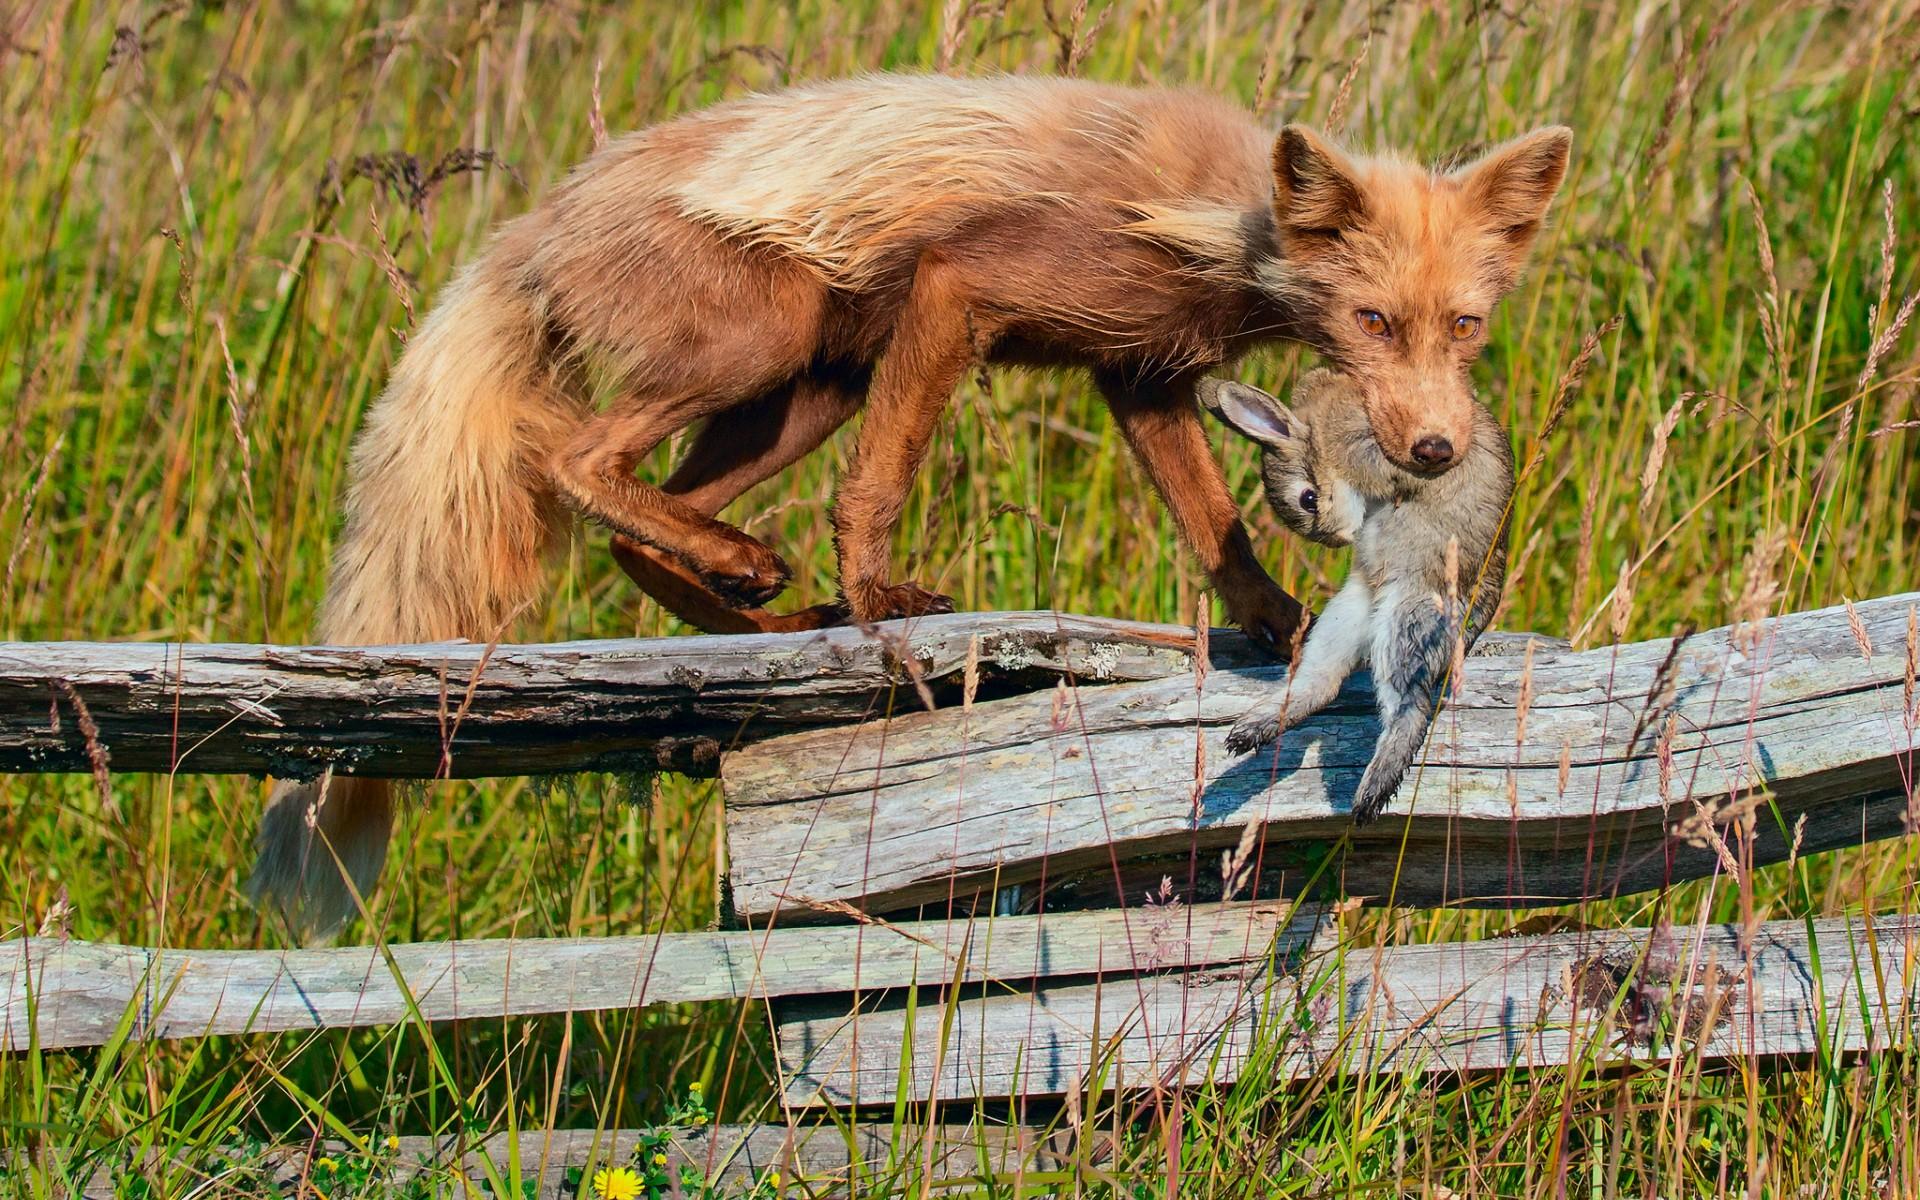 fox rabbit hunting death fence grass wallpaper background 1920x1200